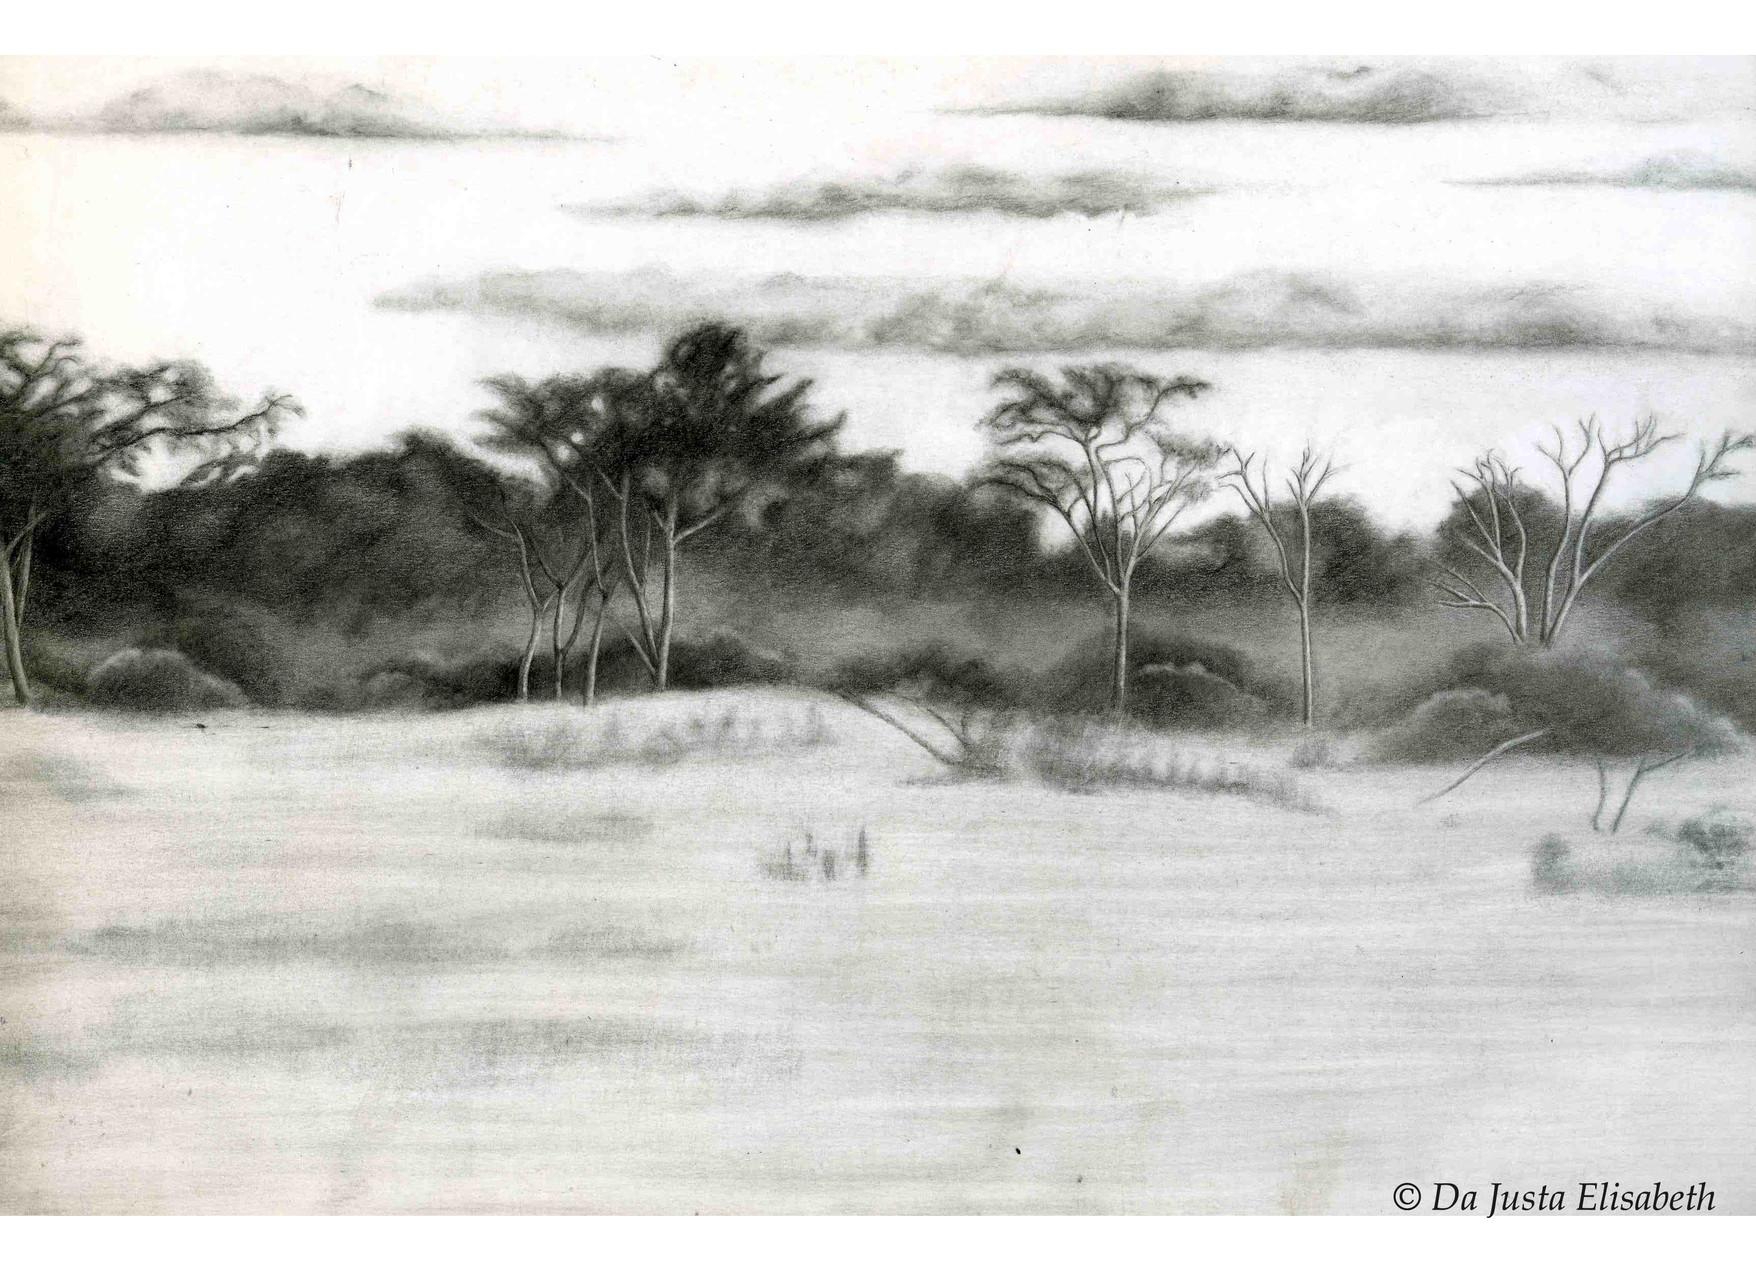 Dessin paysage africain